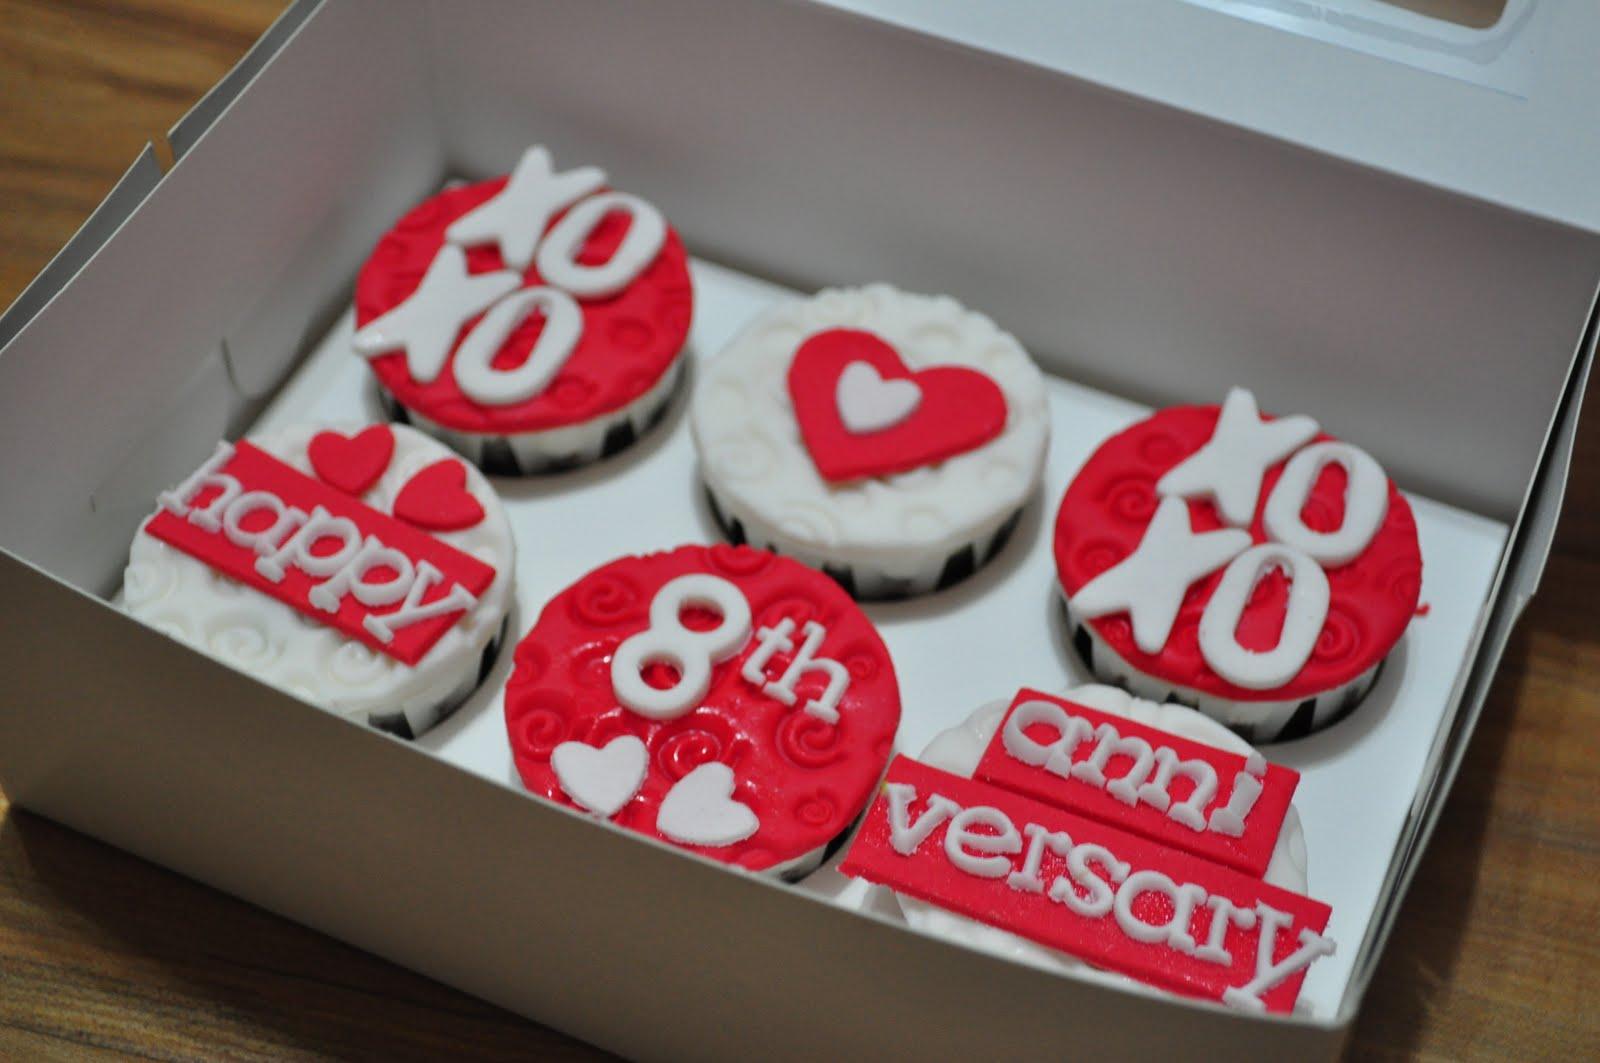 Ruby wedding anniversary heart shape cake truly scrumptious